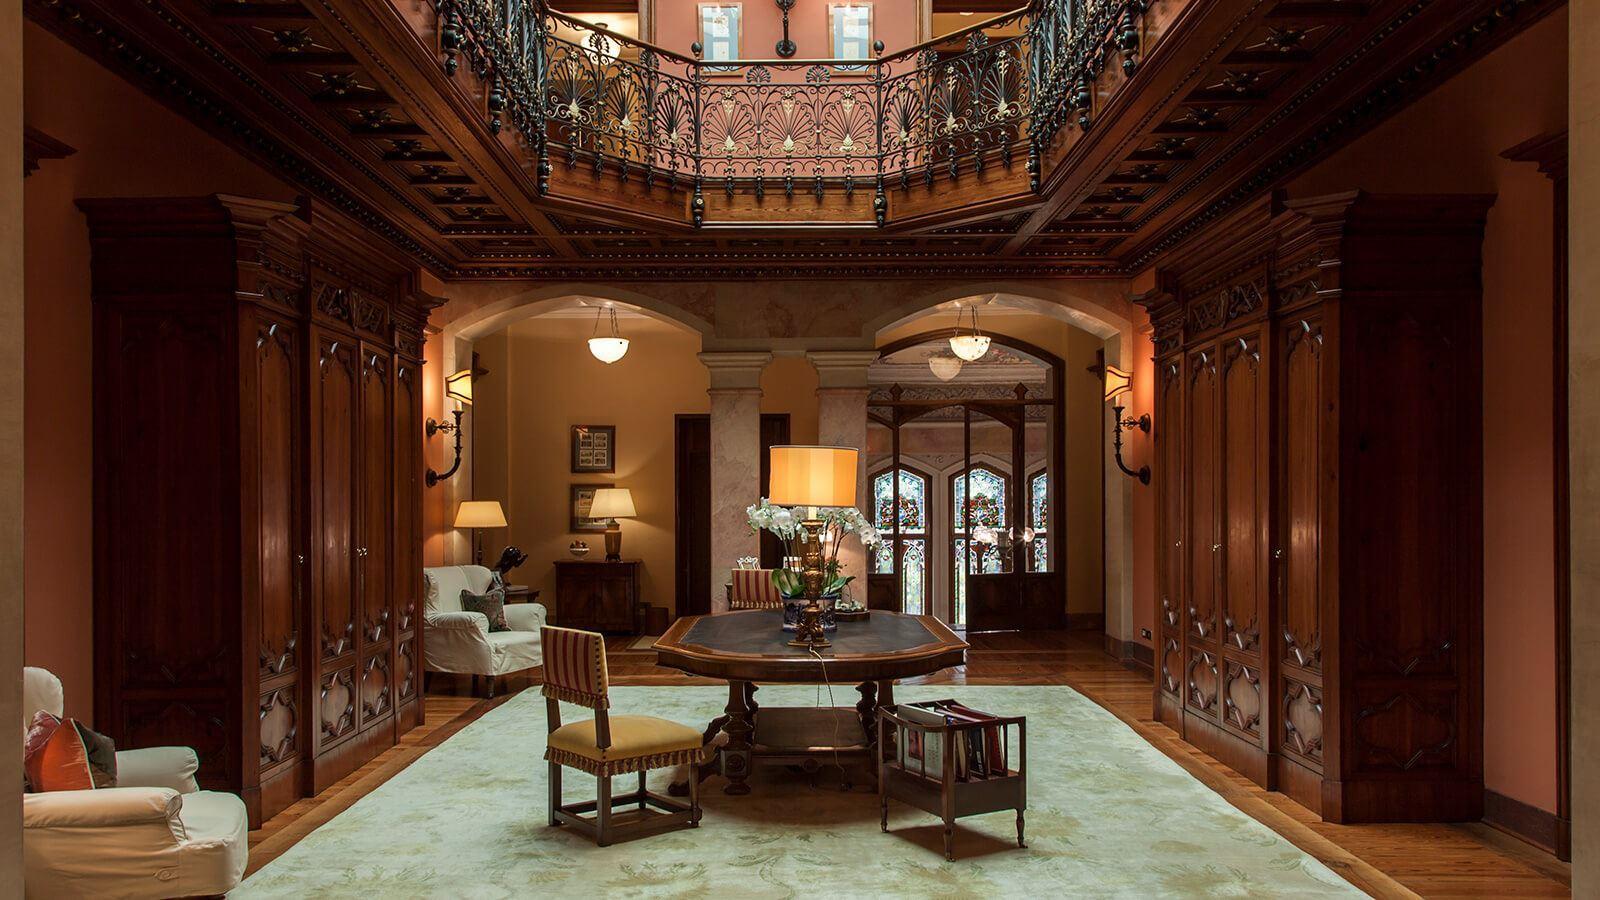 Grand Hotel a Villa Feltrinelli - Hall